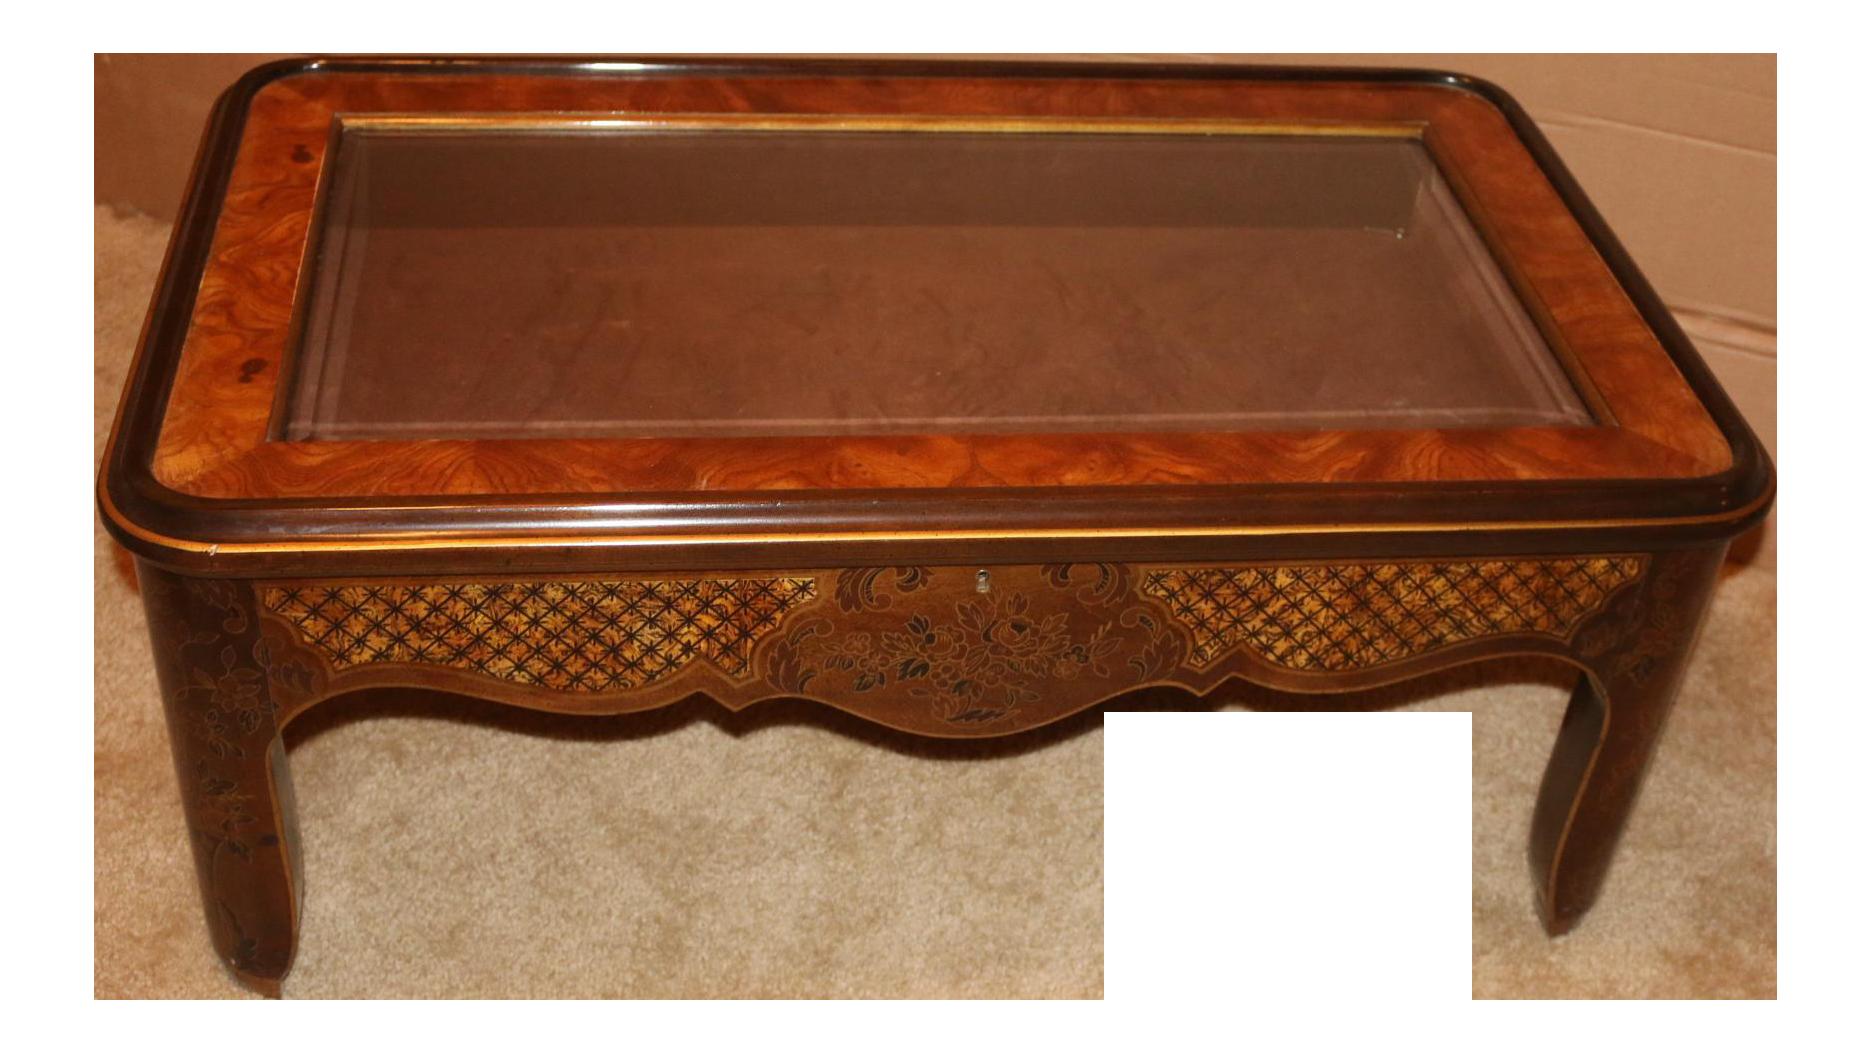 Drexel Curio Glass Top U0026 Burled Wood Coffee Table   Image 1 Of 11